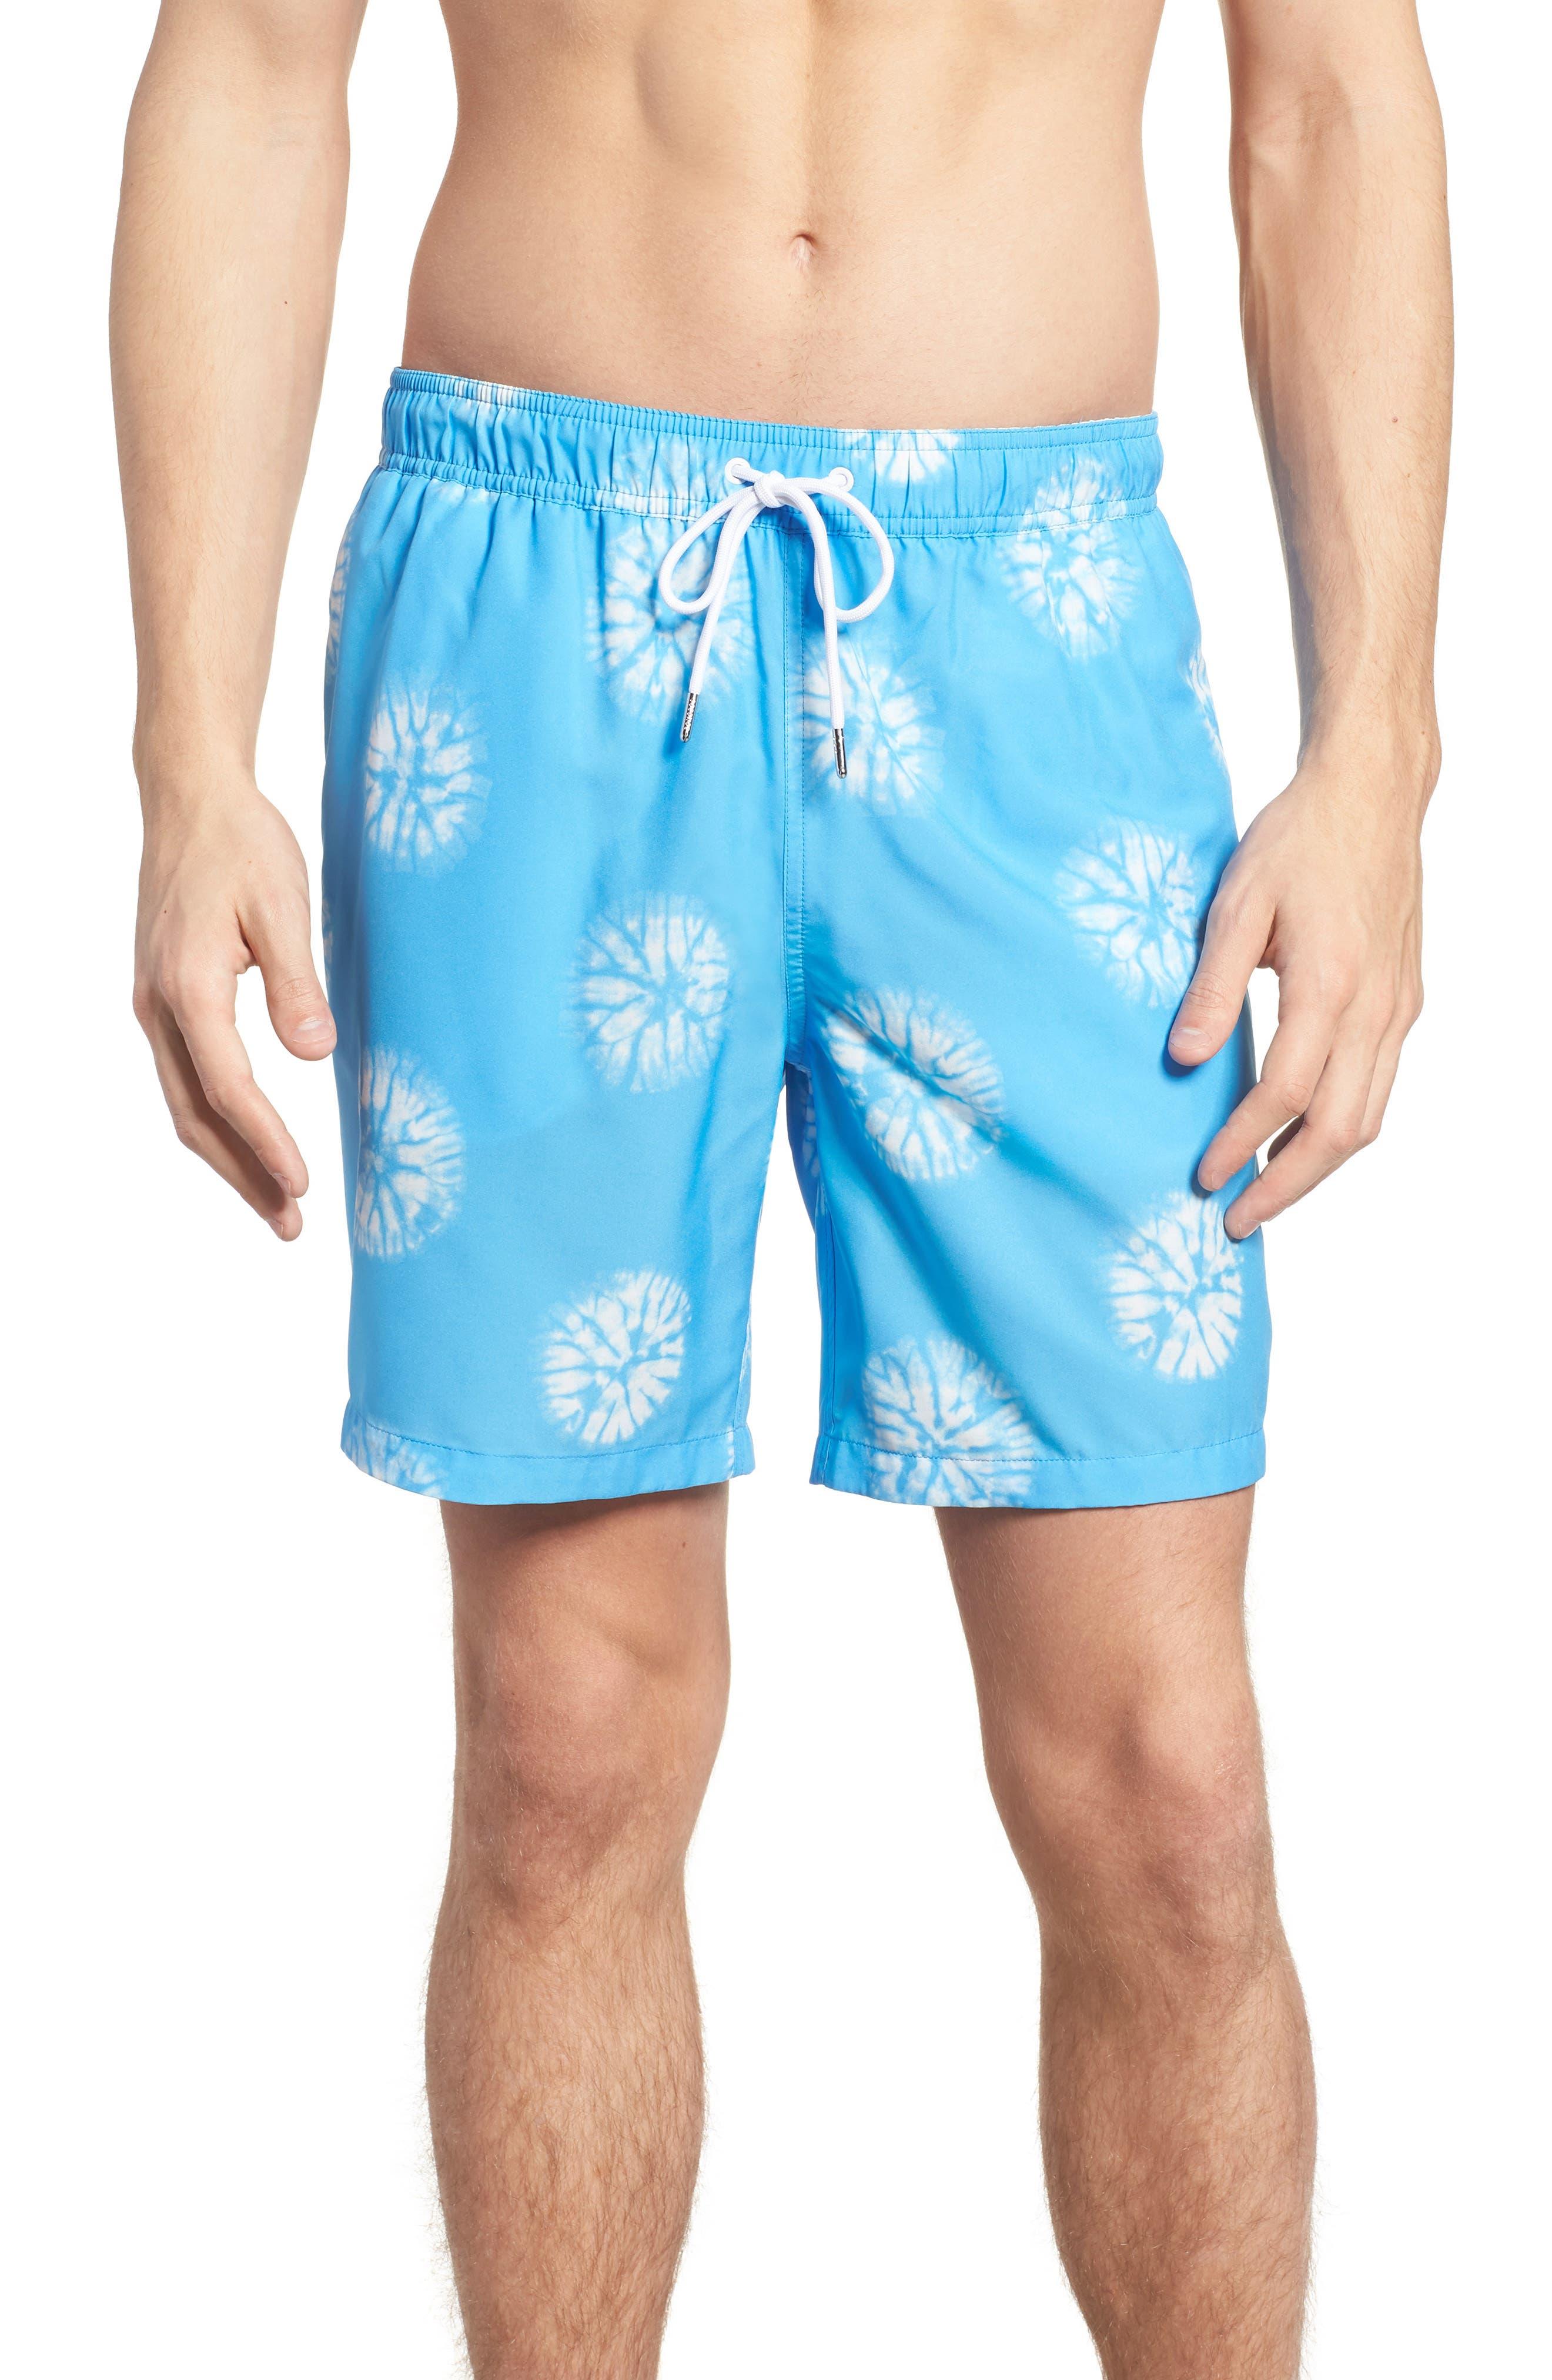 Banzai 7-Inch Swim Trunks,                         Main,                         color, Tie Dye Dots